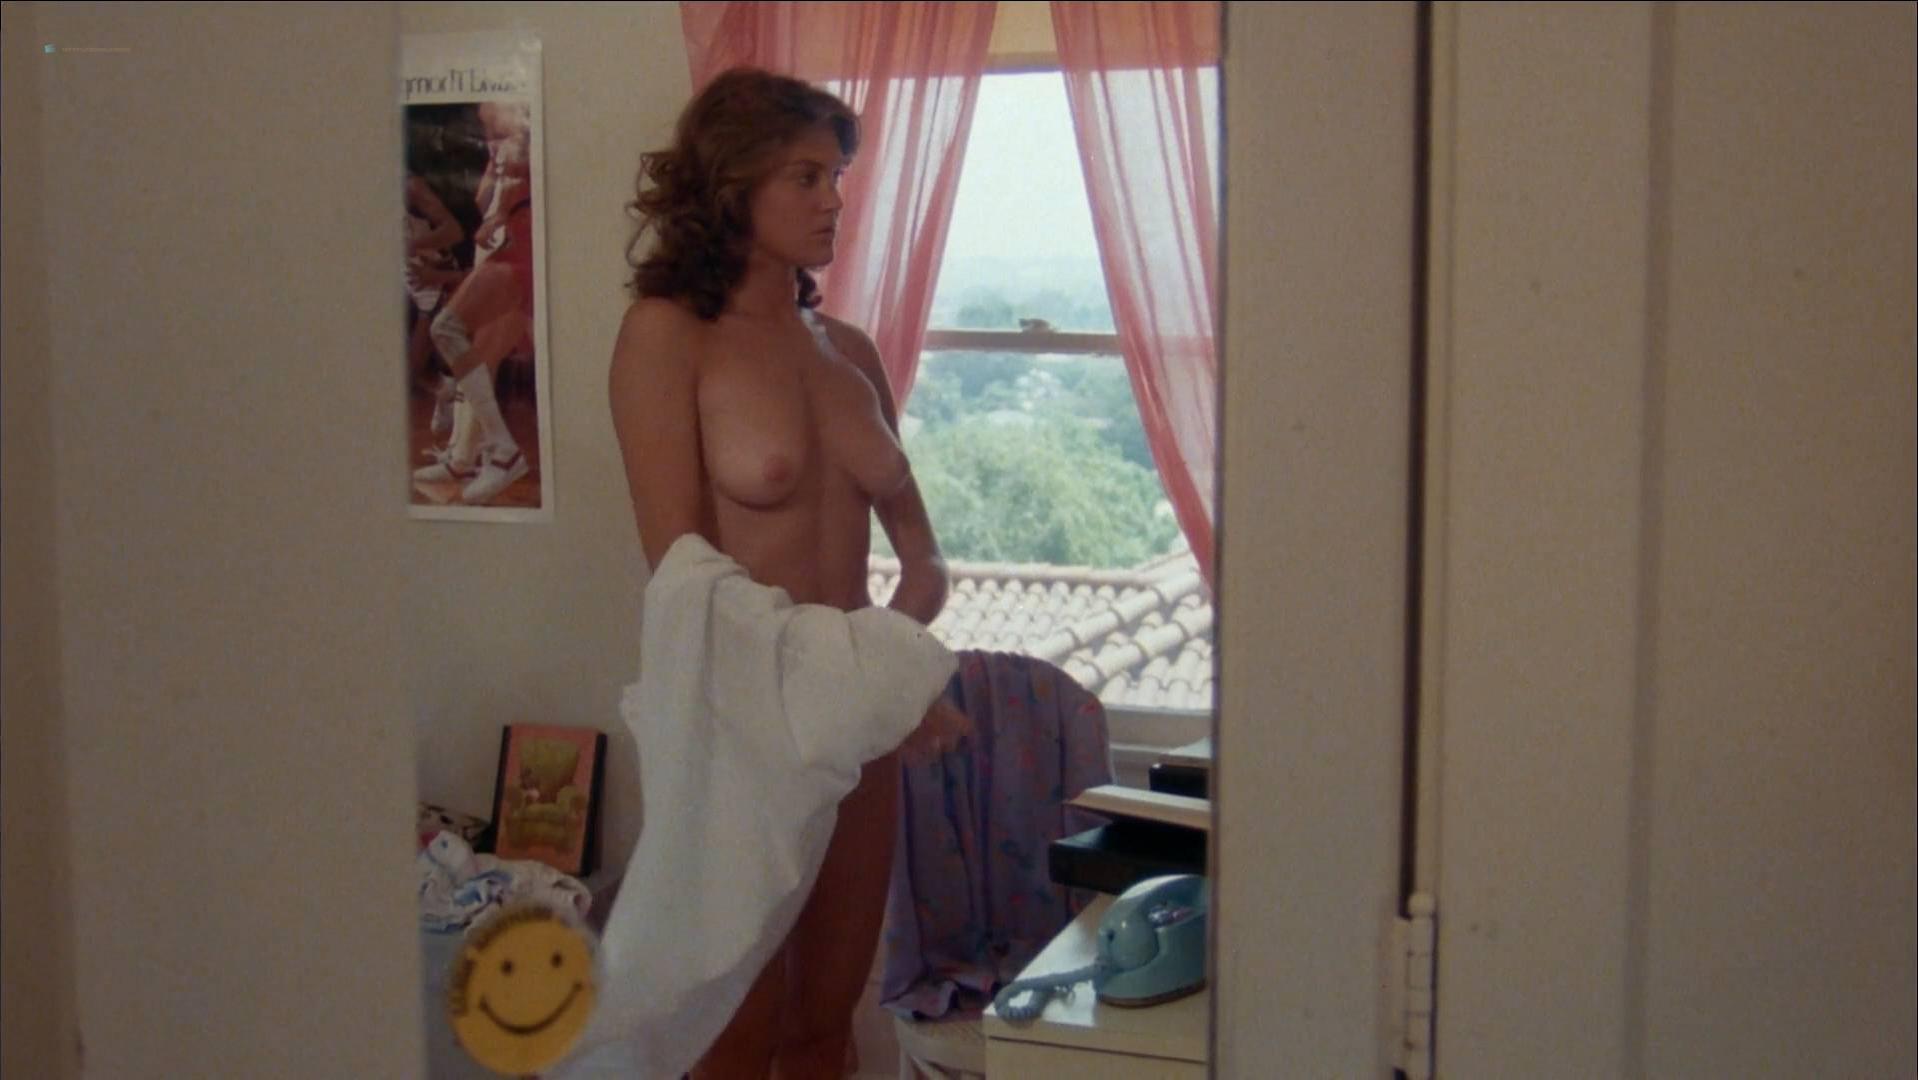 Debra Deliso nude, Brinke Stevens nude, Michelle Micha nude, Gina Smika nude - Slumber Party Massacre (1982)